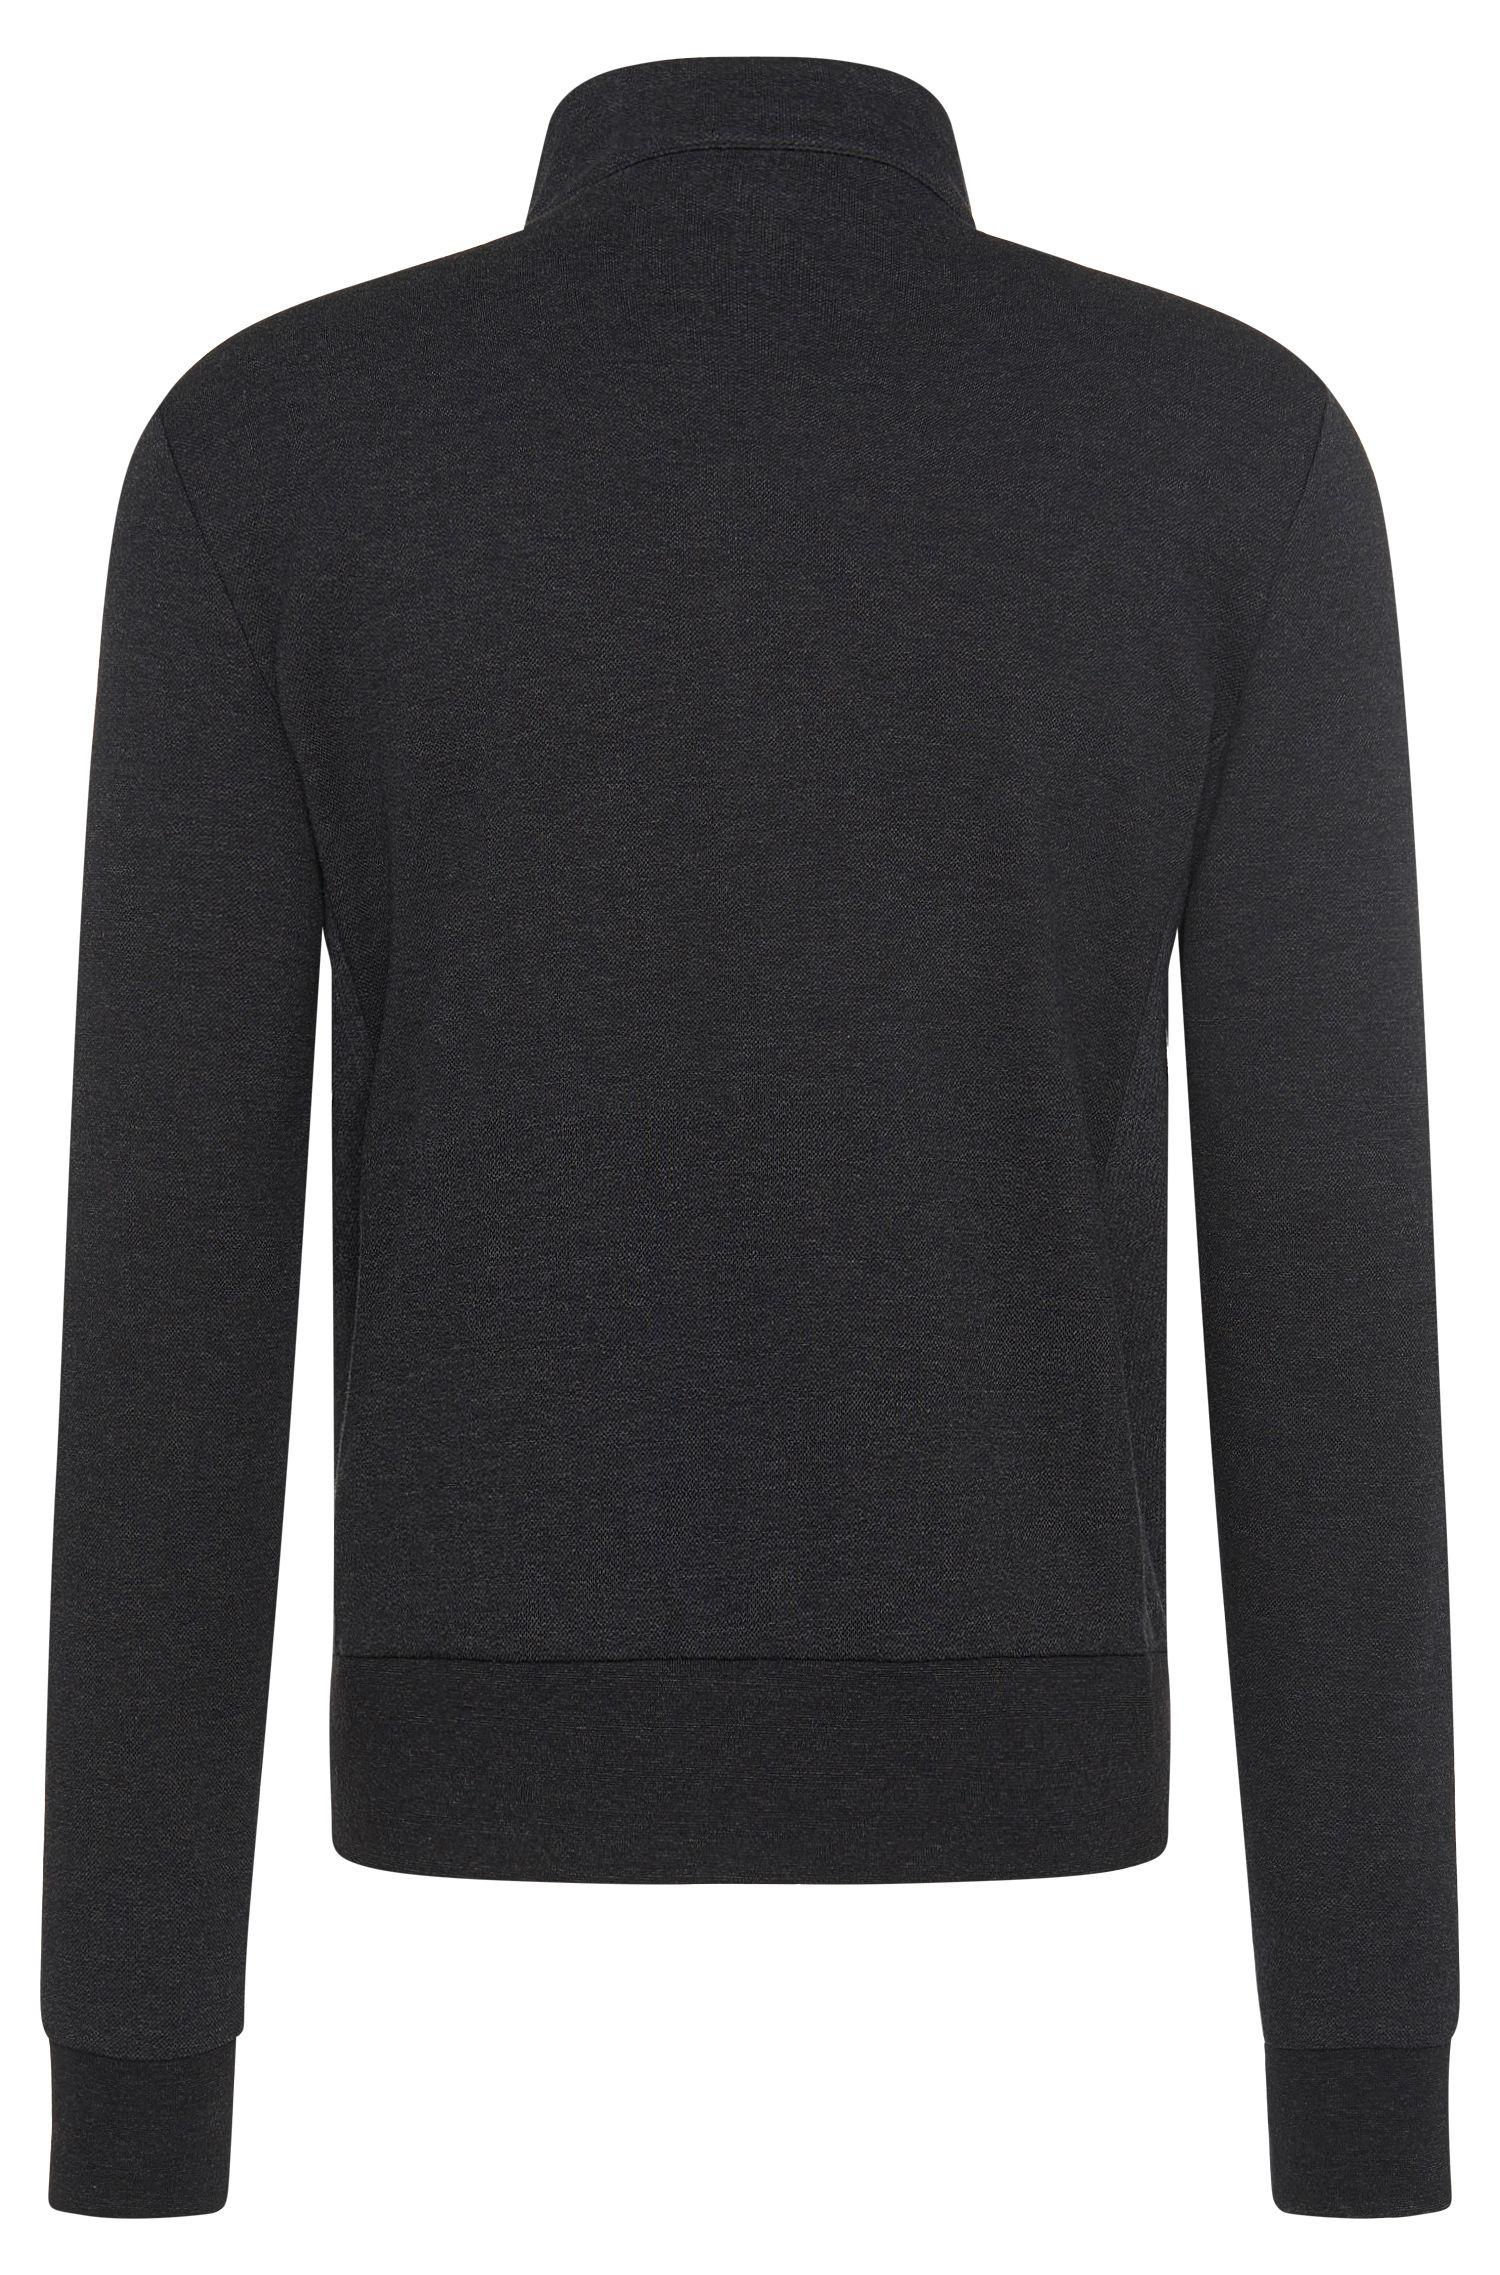 Melierte Regular-Fit Sweatshirt-Jacke aus Baumwolle: 'Sommers 10'